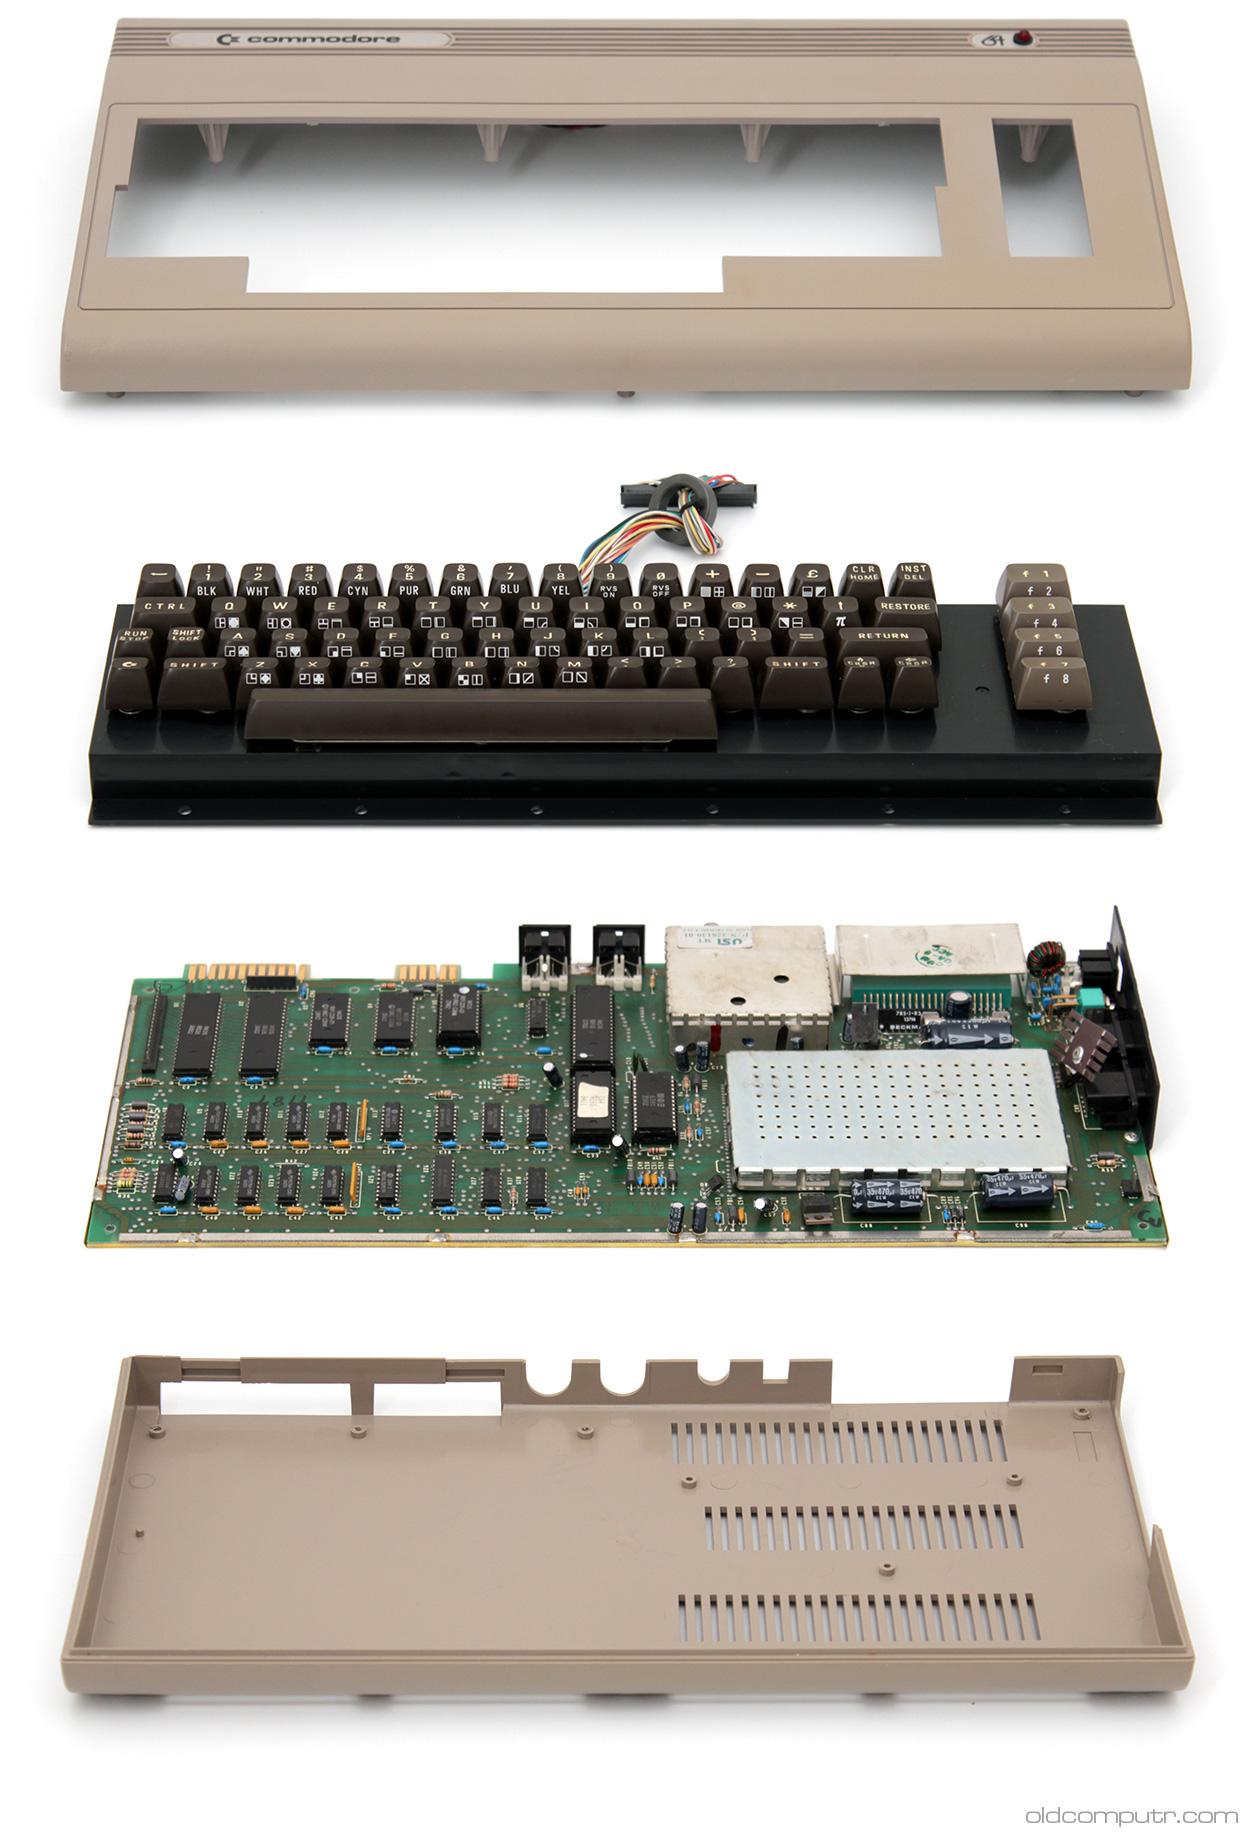 Commodore 64 - teardown